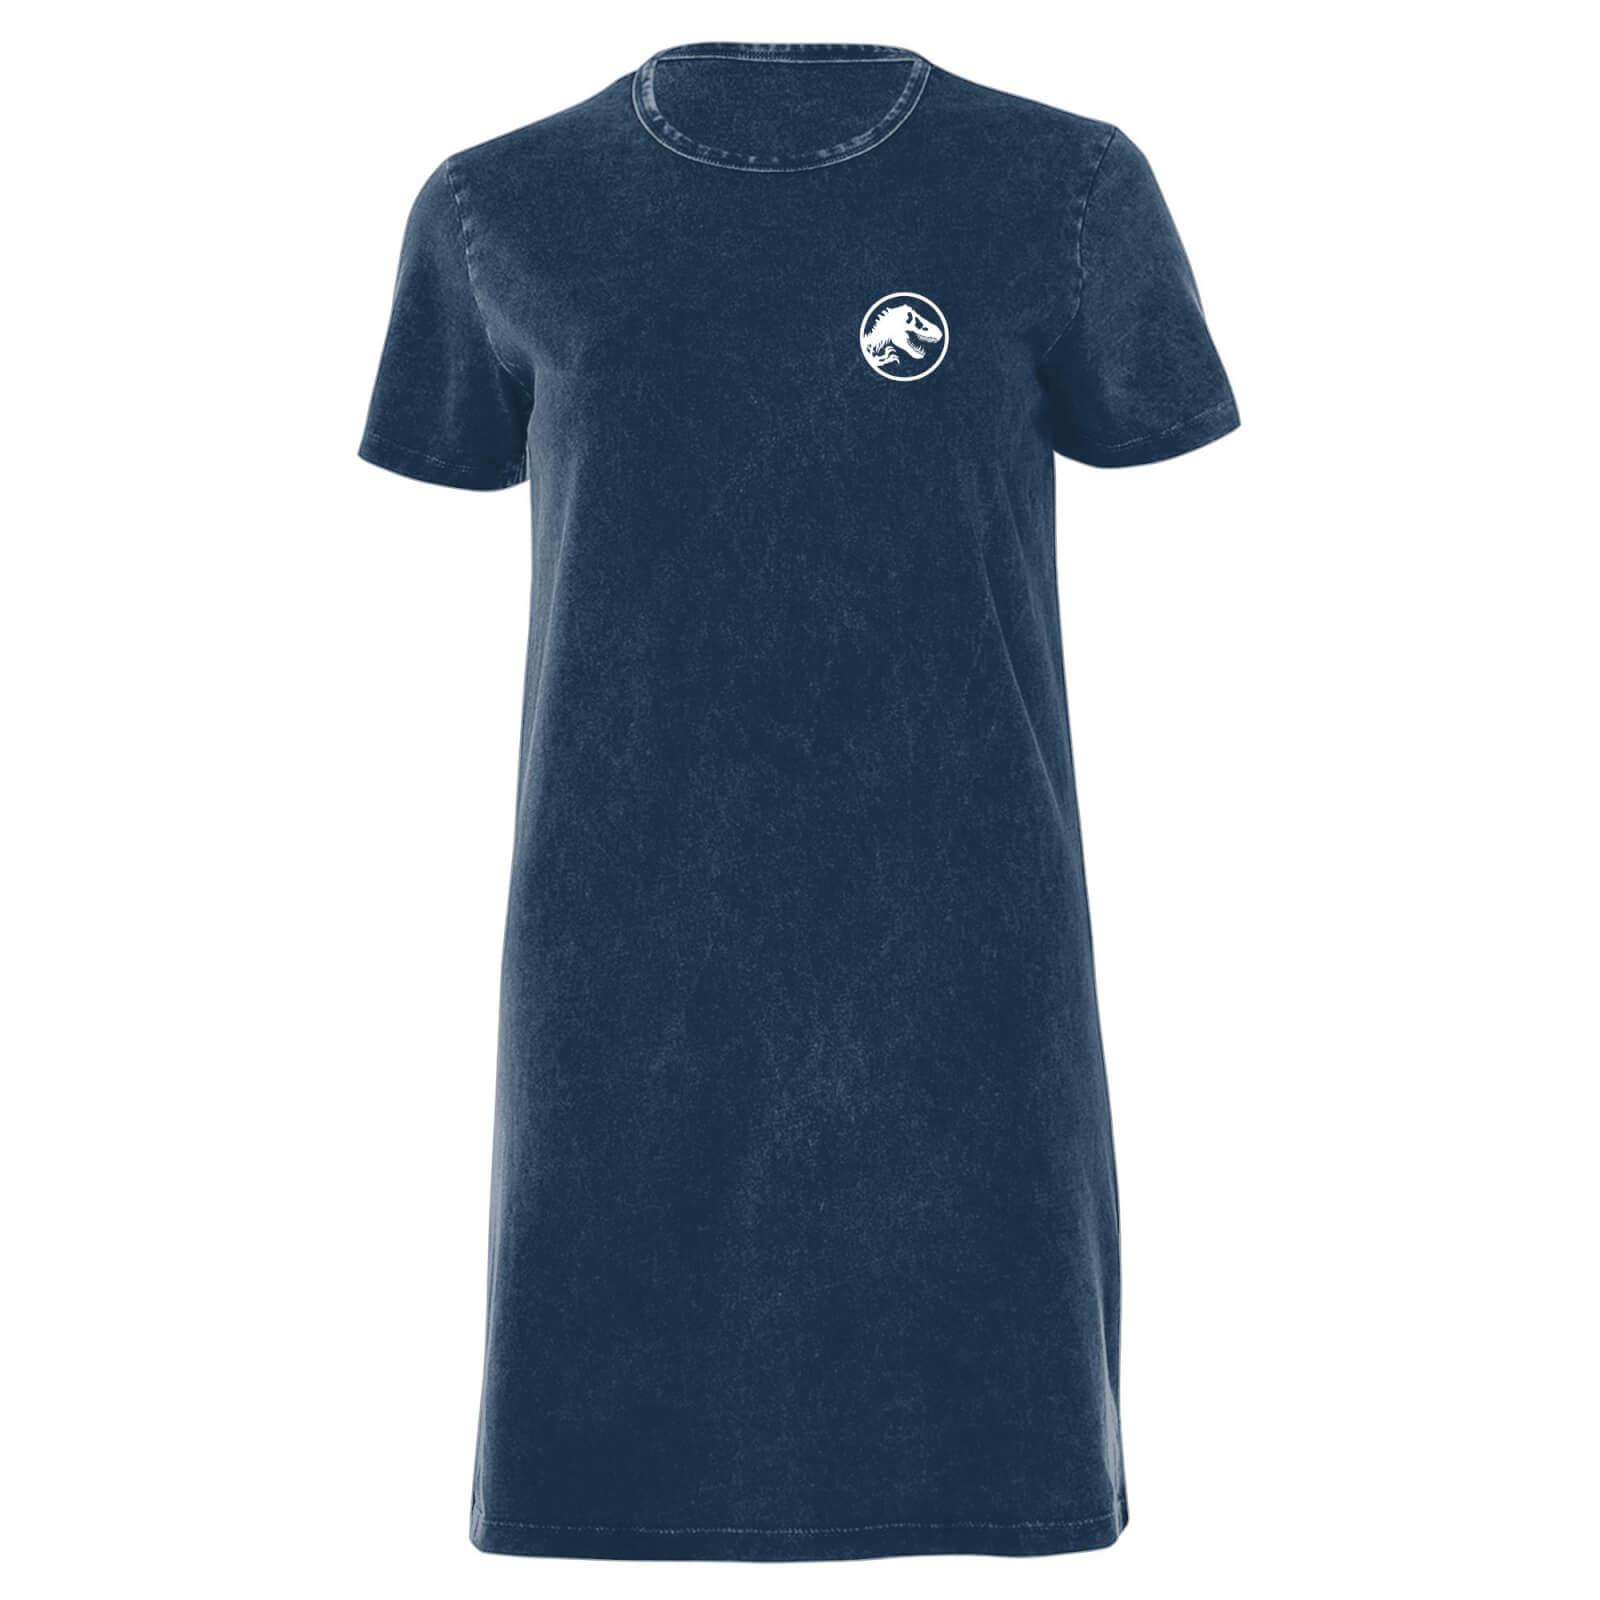 Jurassic Park White Women's T-Shirt Dress - Navy Acid Wash - S - Navy Acid Wash